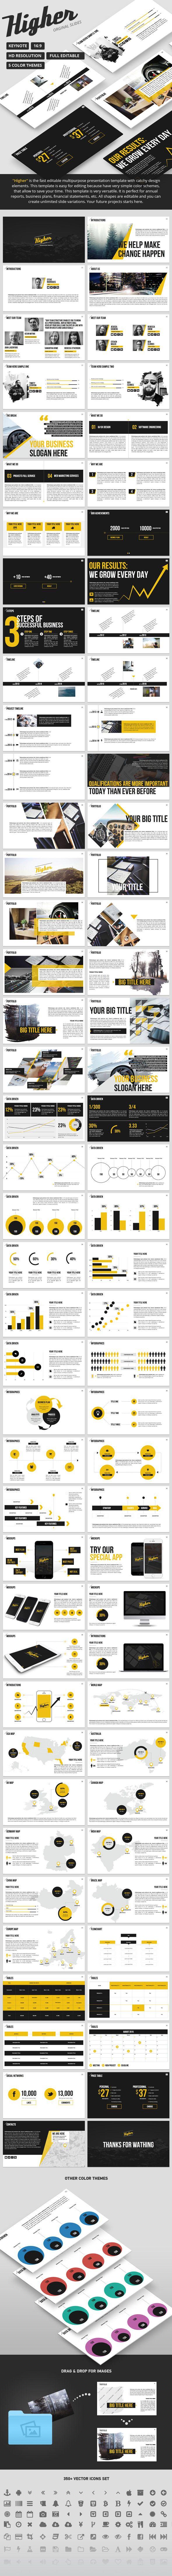 Higher - Creative Keynote Template | Brillar y Formato